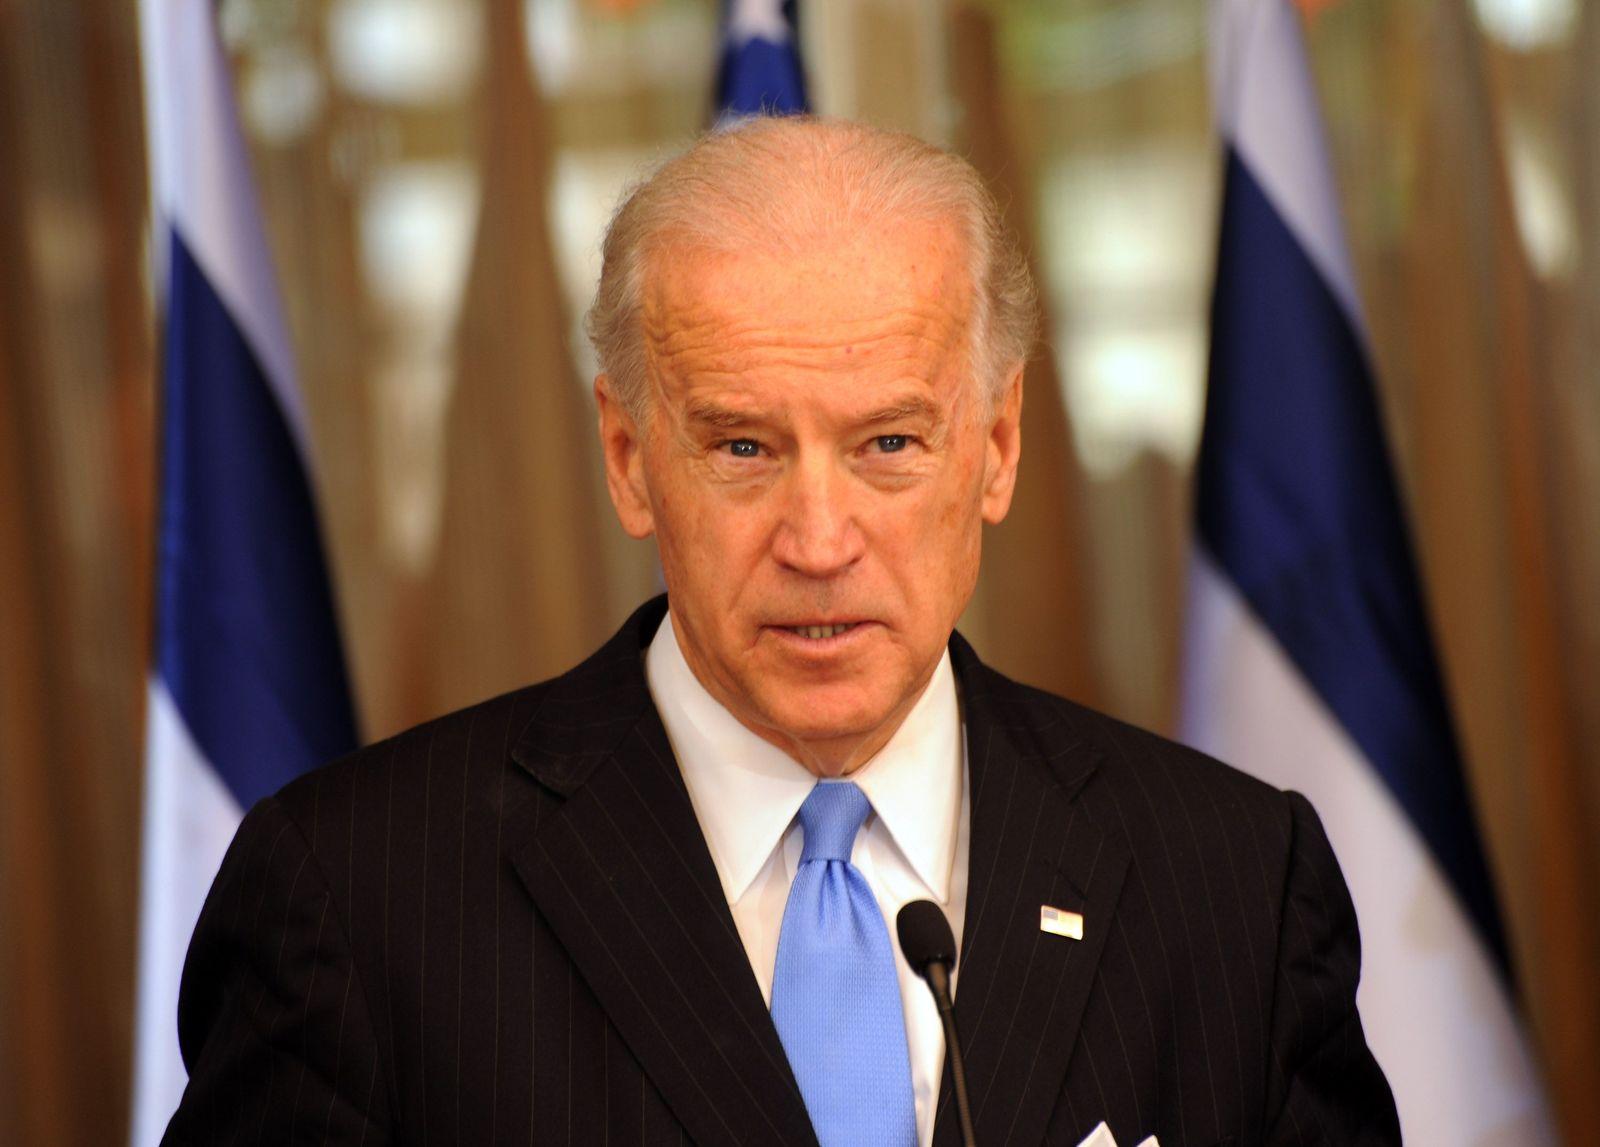 US VICE PRESIDENT JOE BIDEN MEETS ISRAELI PM BENJAMIN NETANYAHU